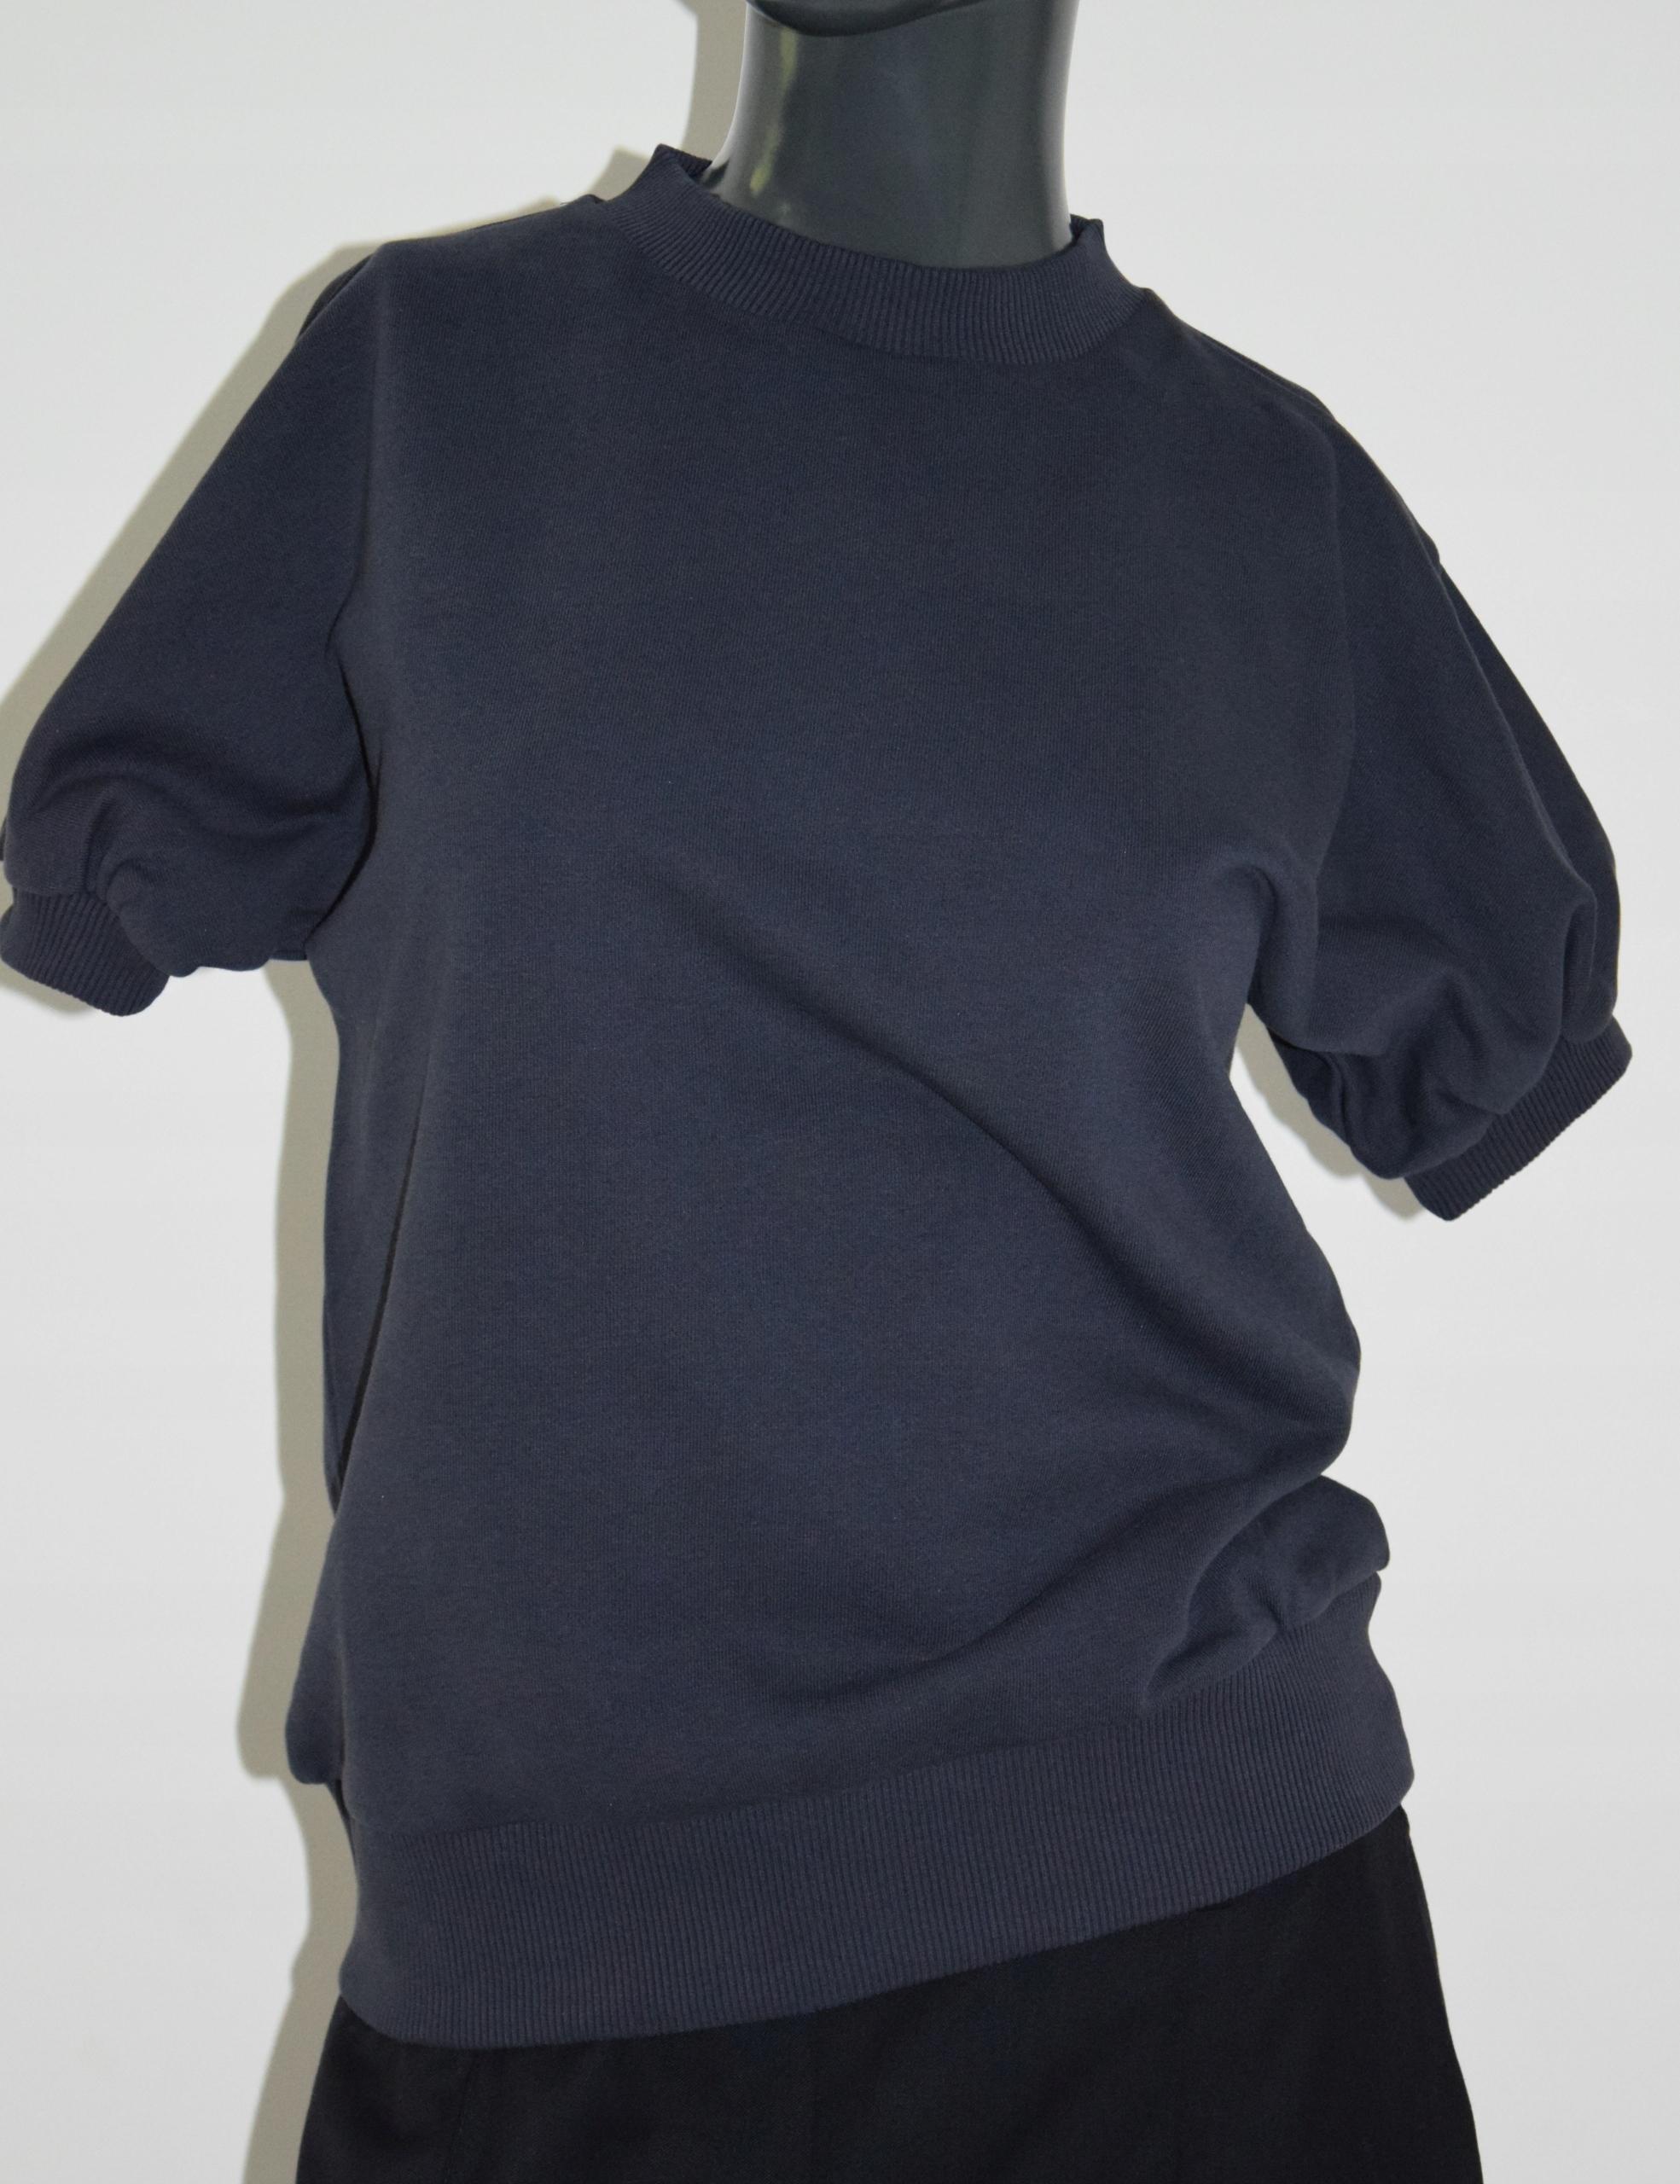 cos dresowa granatowa bluzka bawełna bufki XS/34